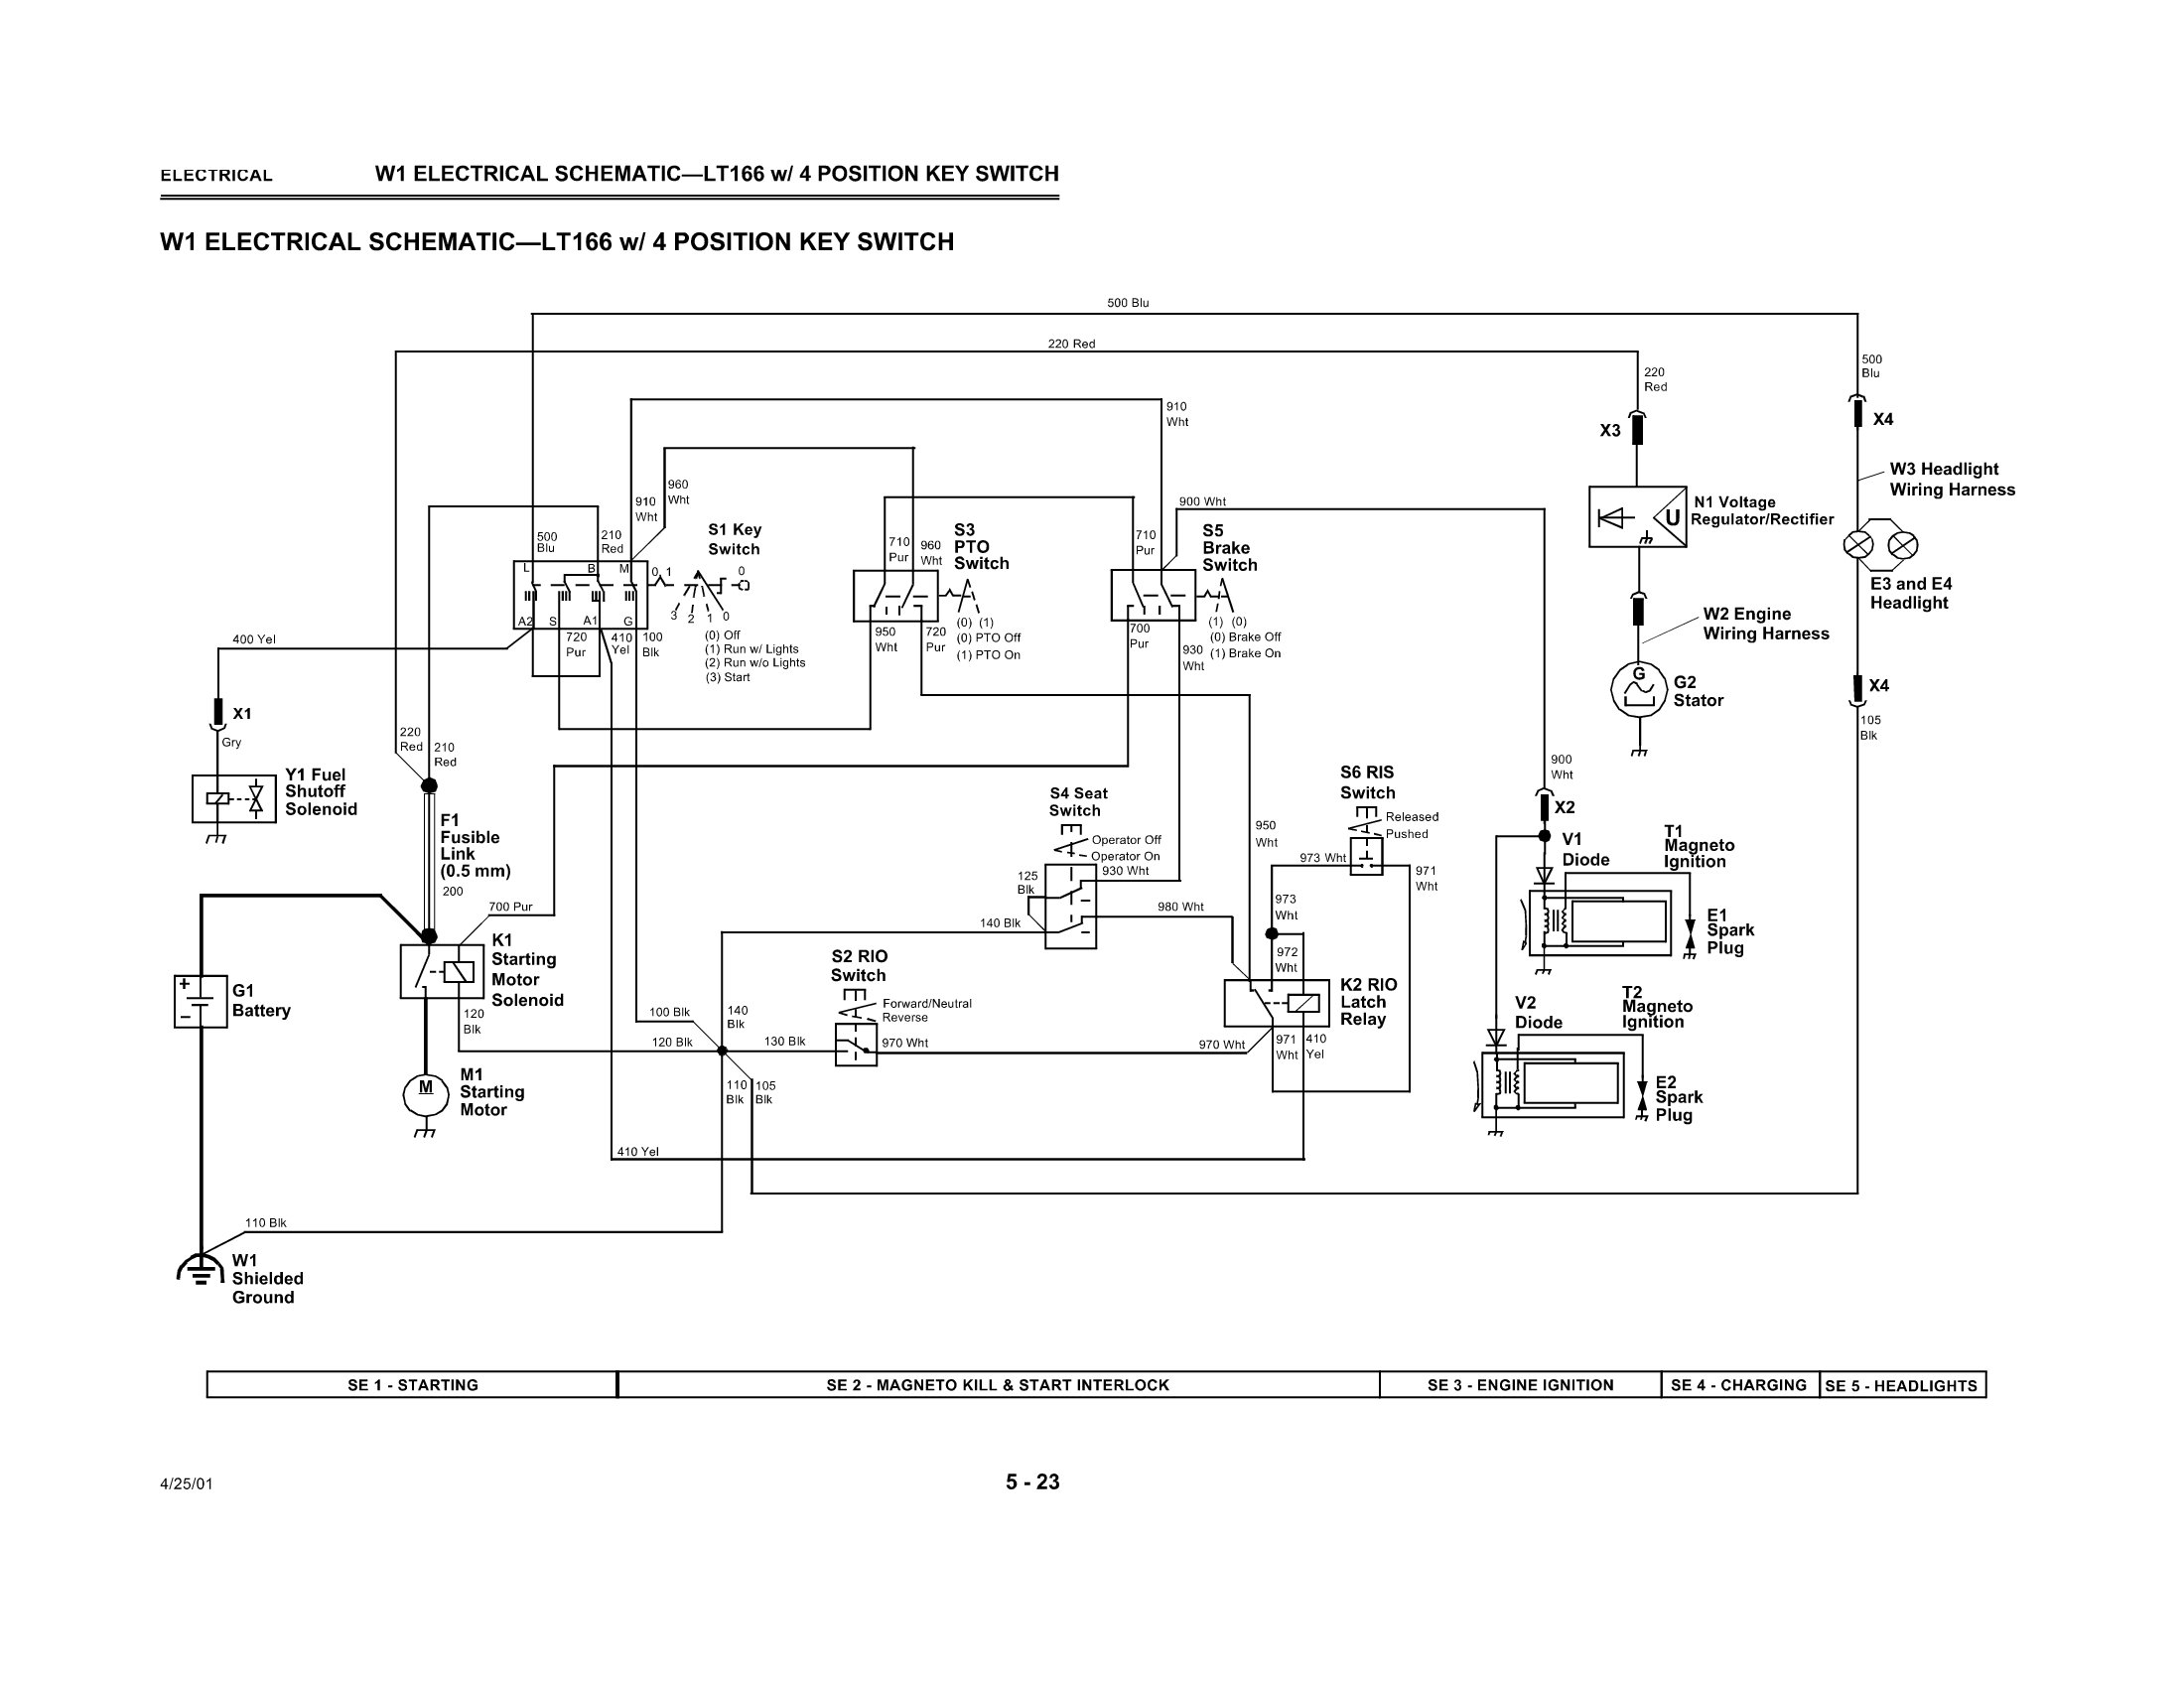 John Deere Lt155 Wiring Diagram Colored Diagrams F911 Engine Catalog Auto Lt133 Schematic Parts